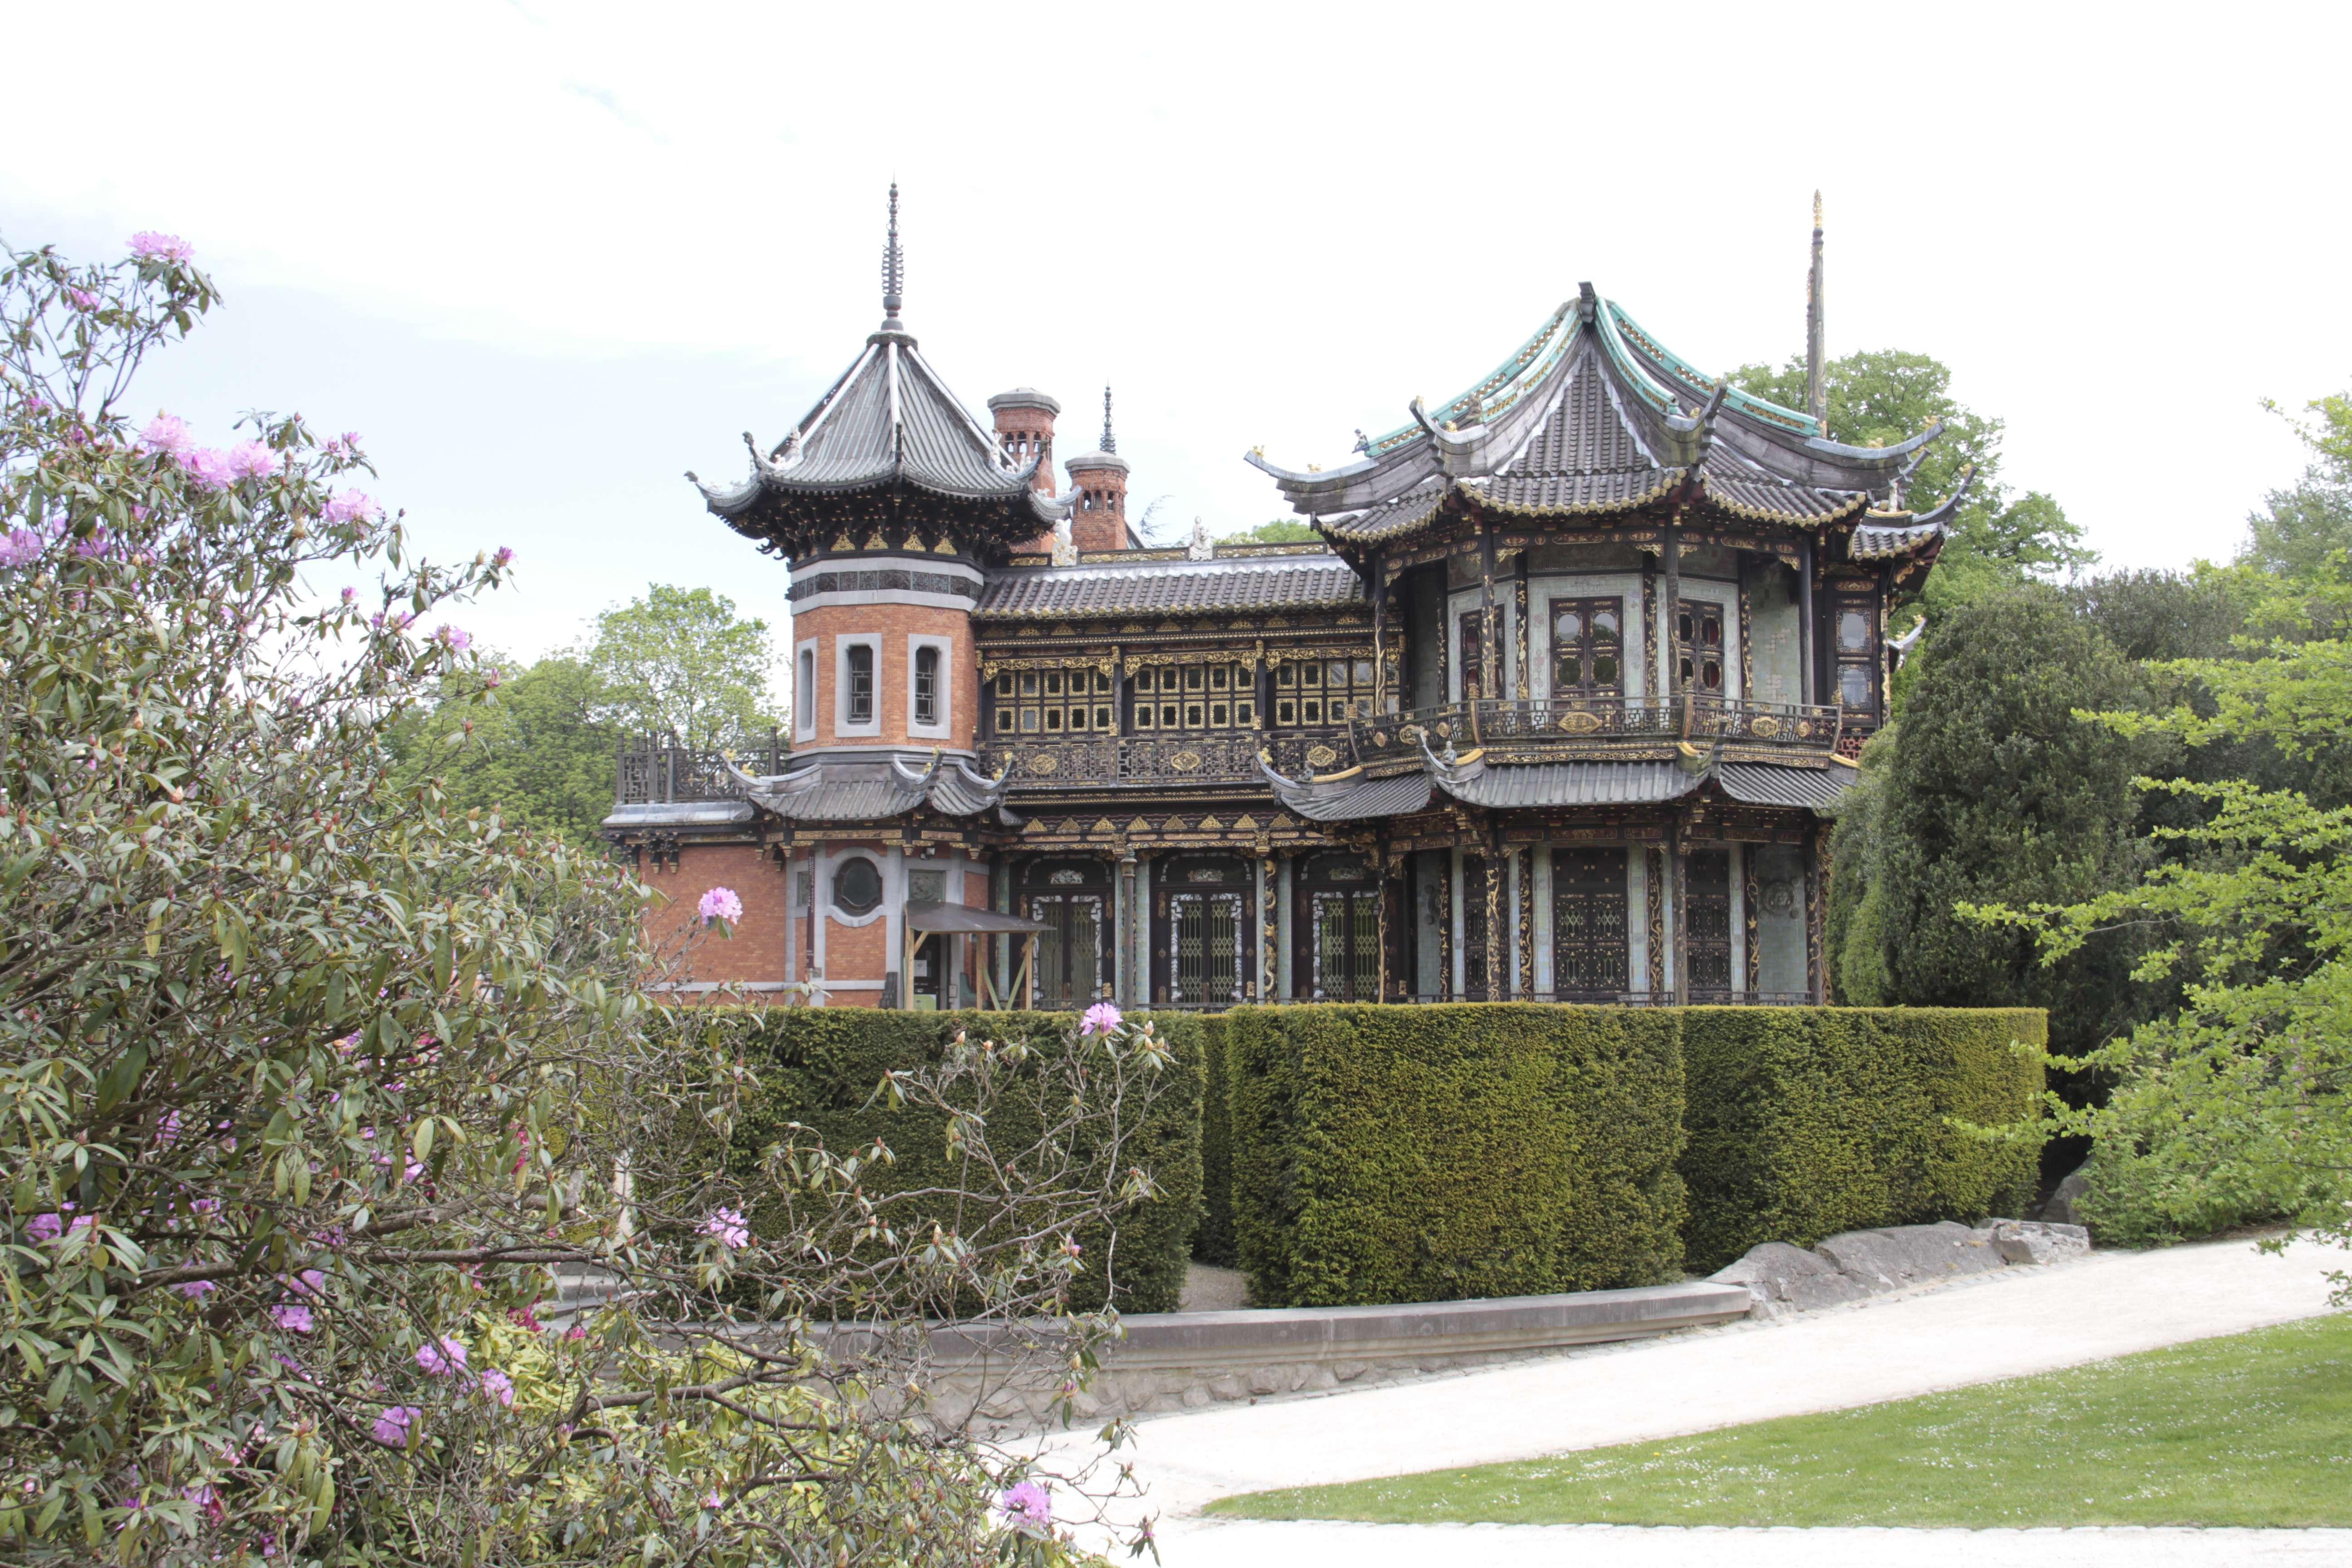 Belgique mai 2015_0087 Bruxelles Laeken pavillon chinois